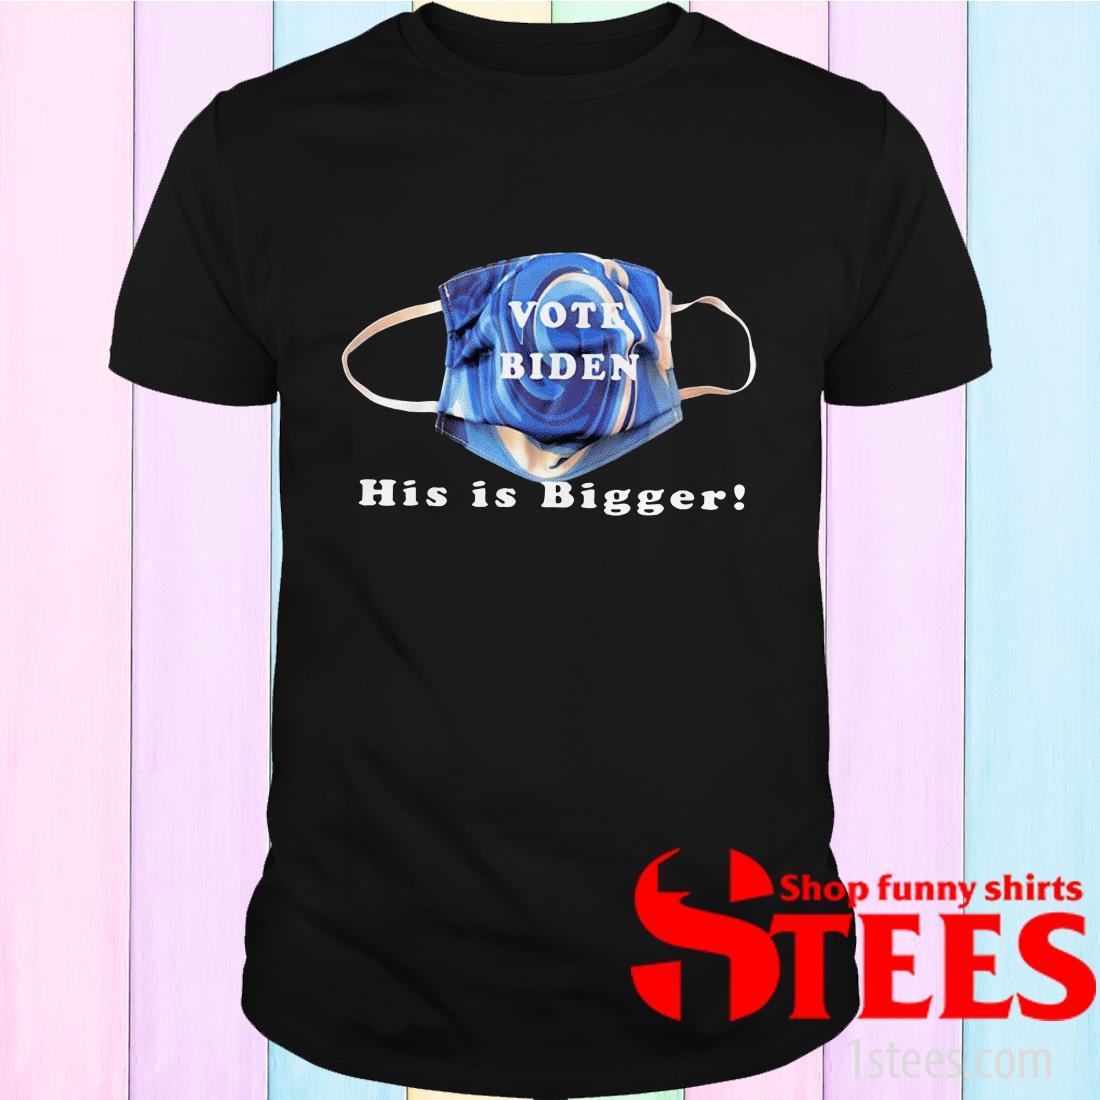 Vote biden his is bigger! Unisex t-shirt